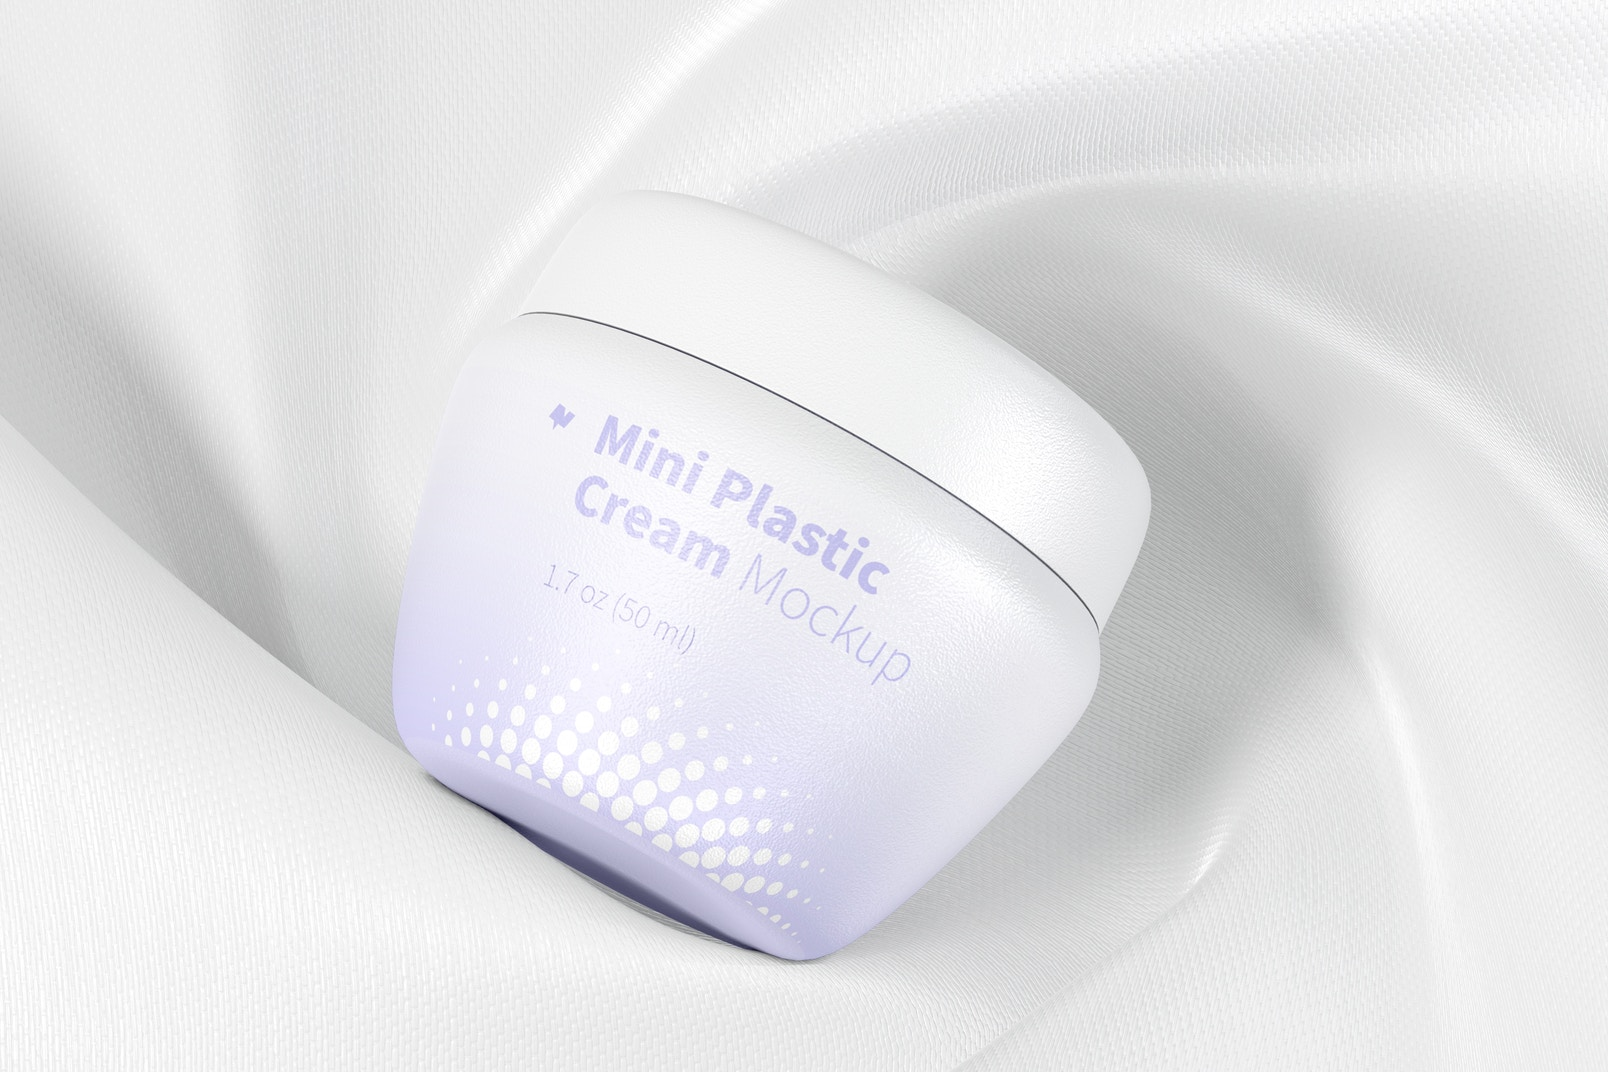 Mini Plastic Cream Jar with Lid Mockup, Top View